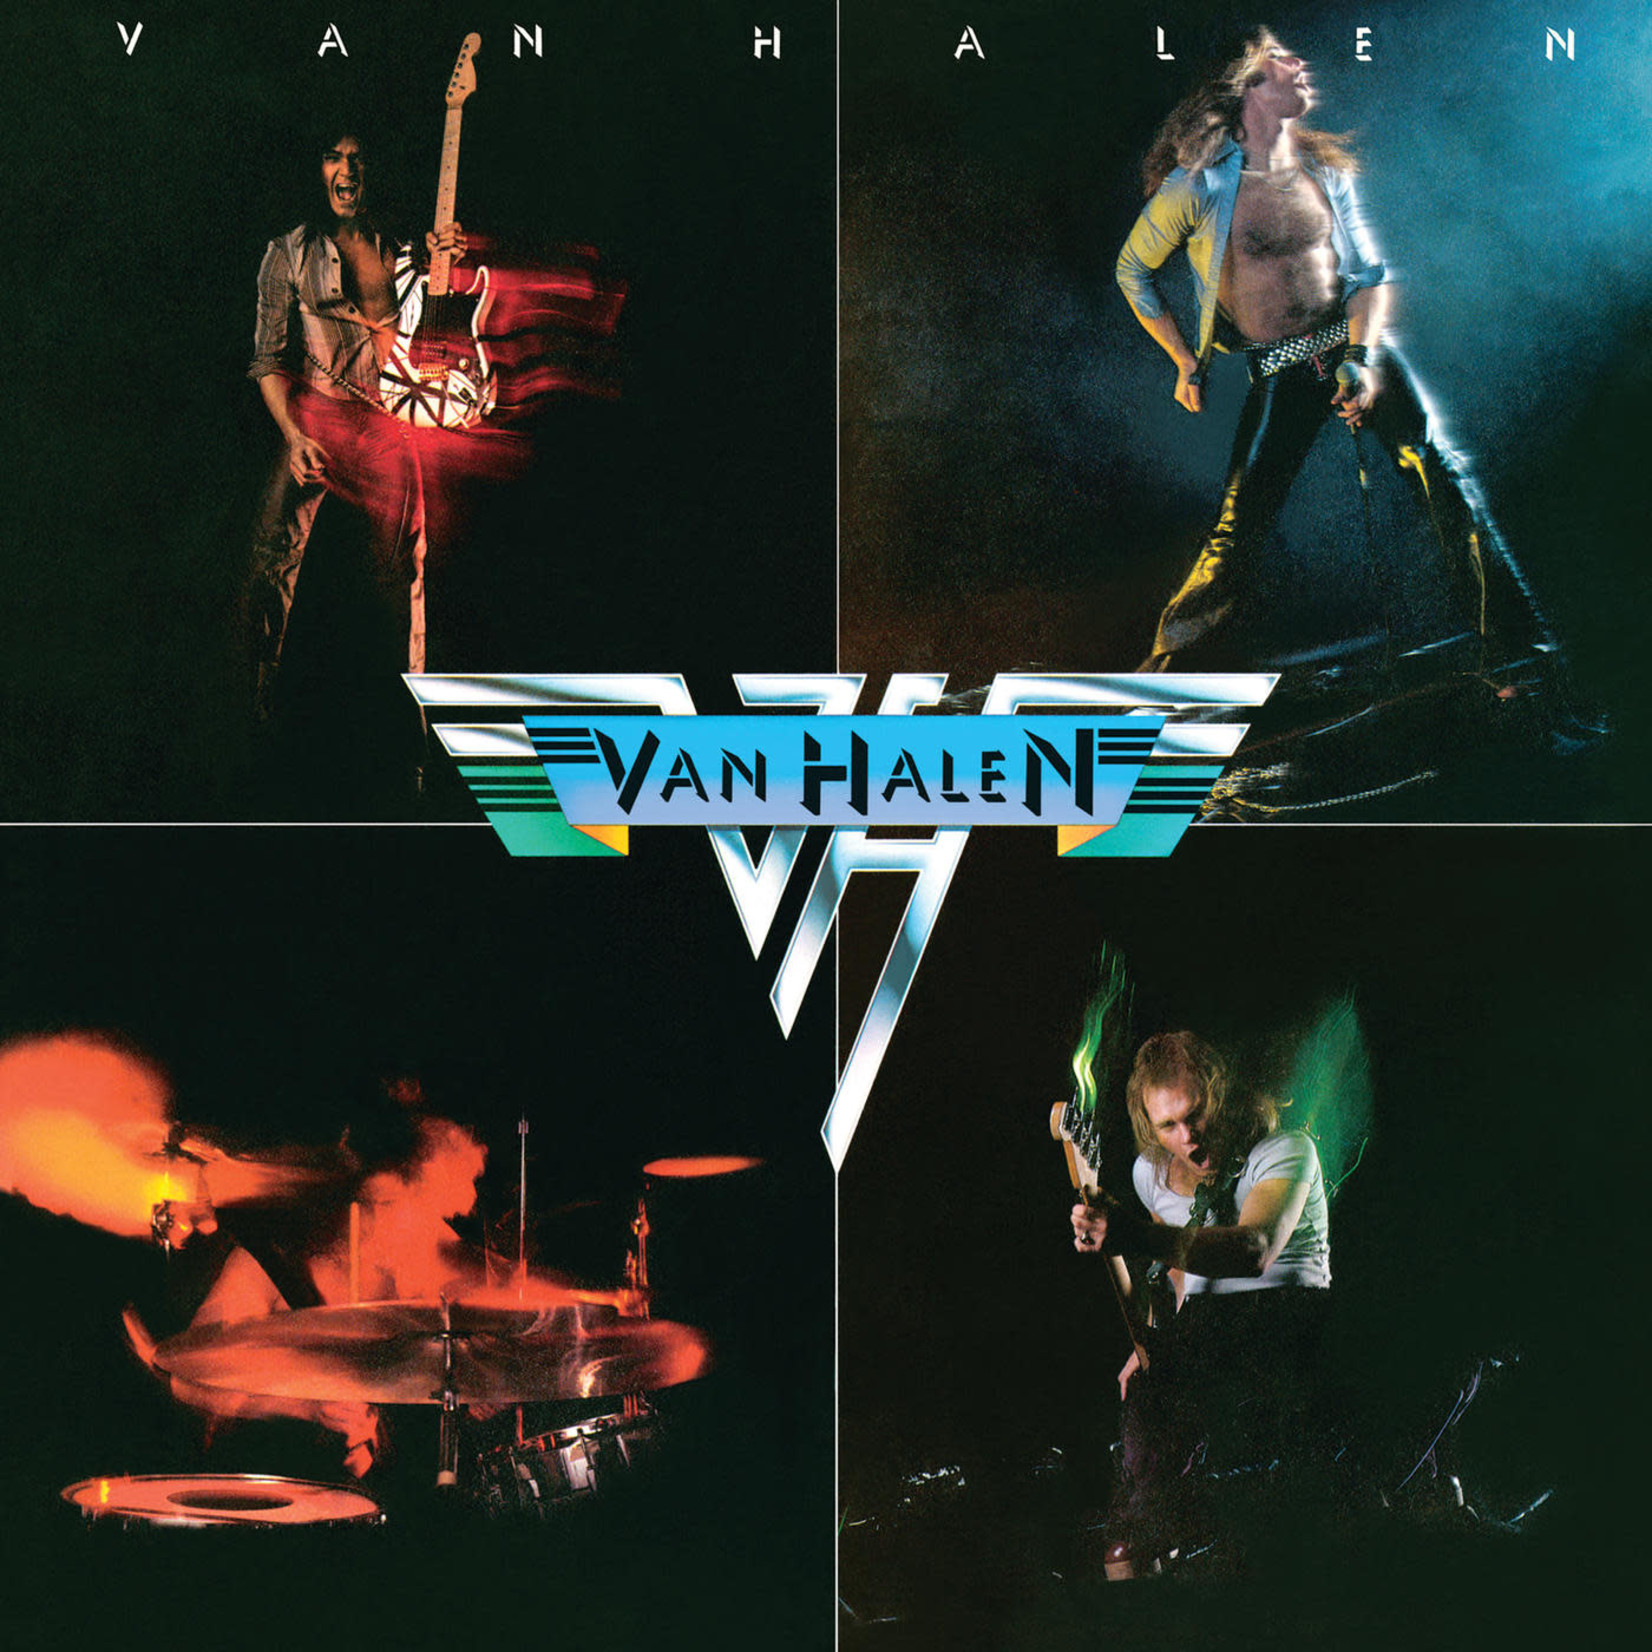 [Vintage] Van Halen: self-titled